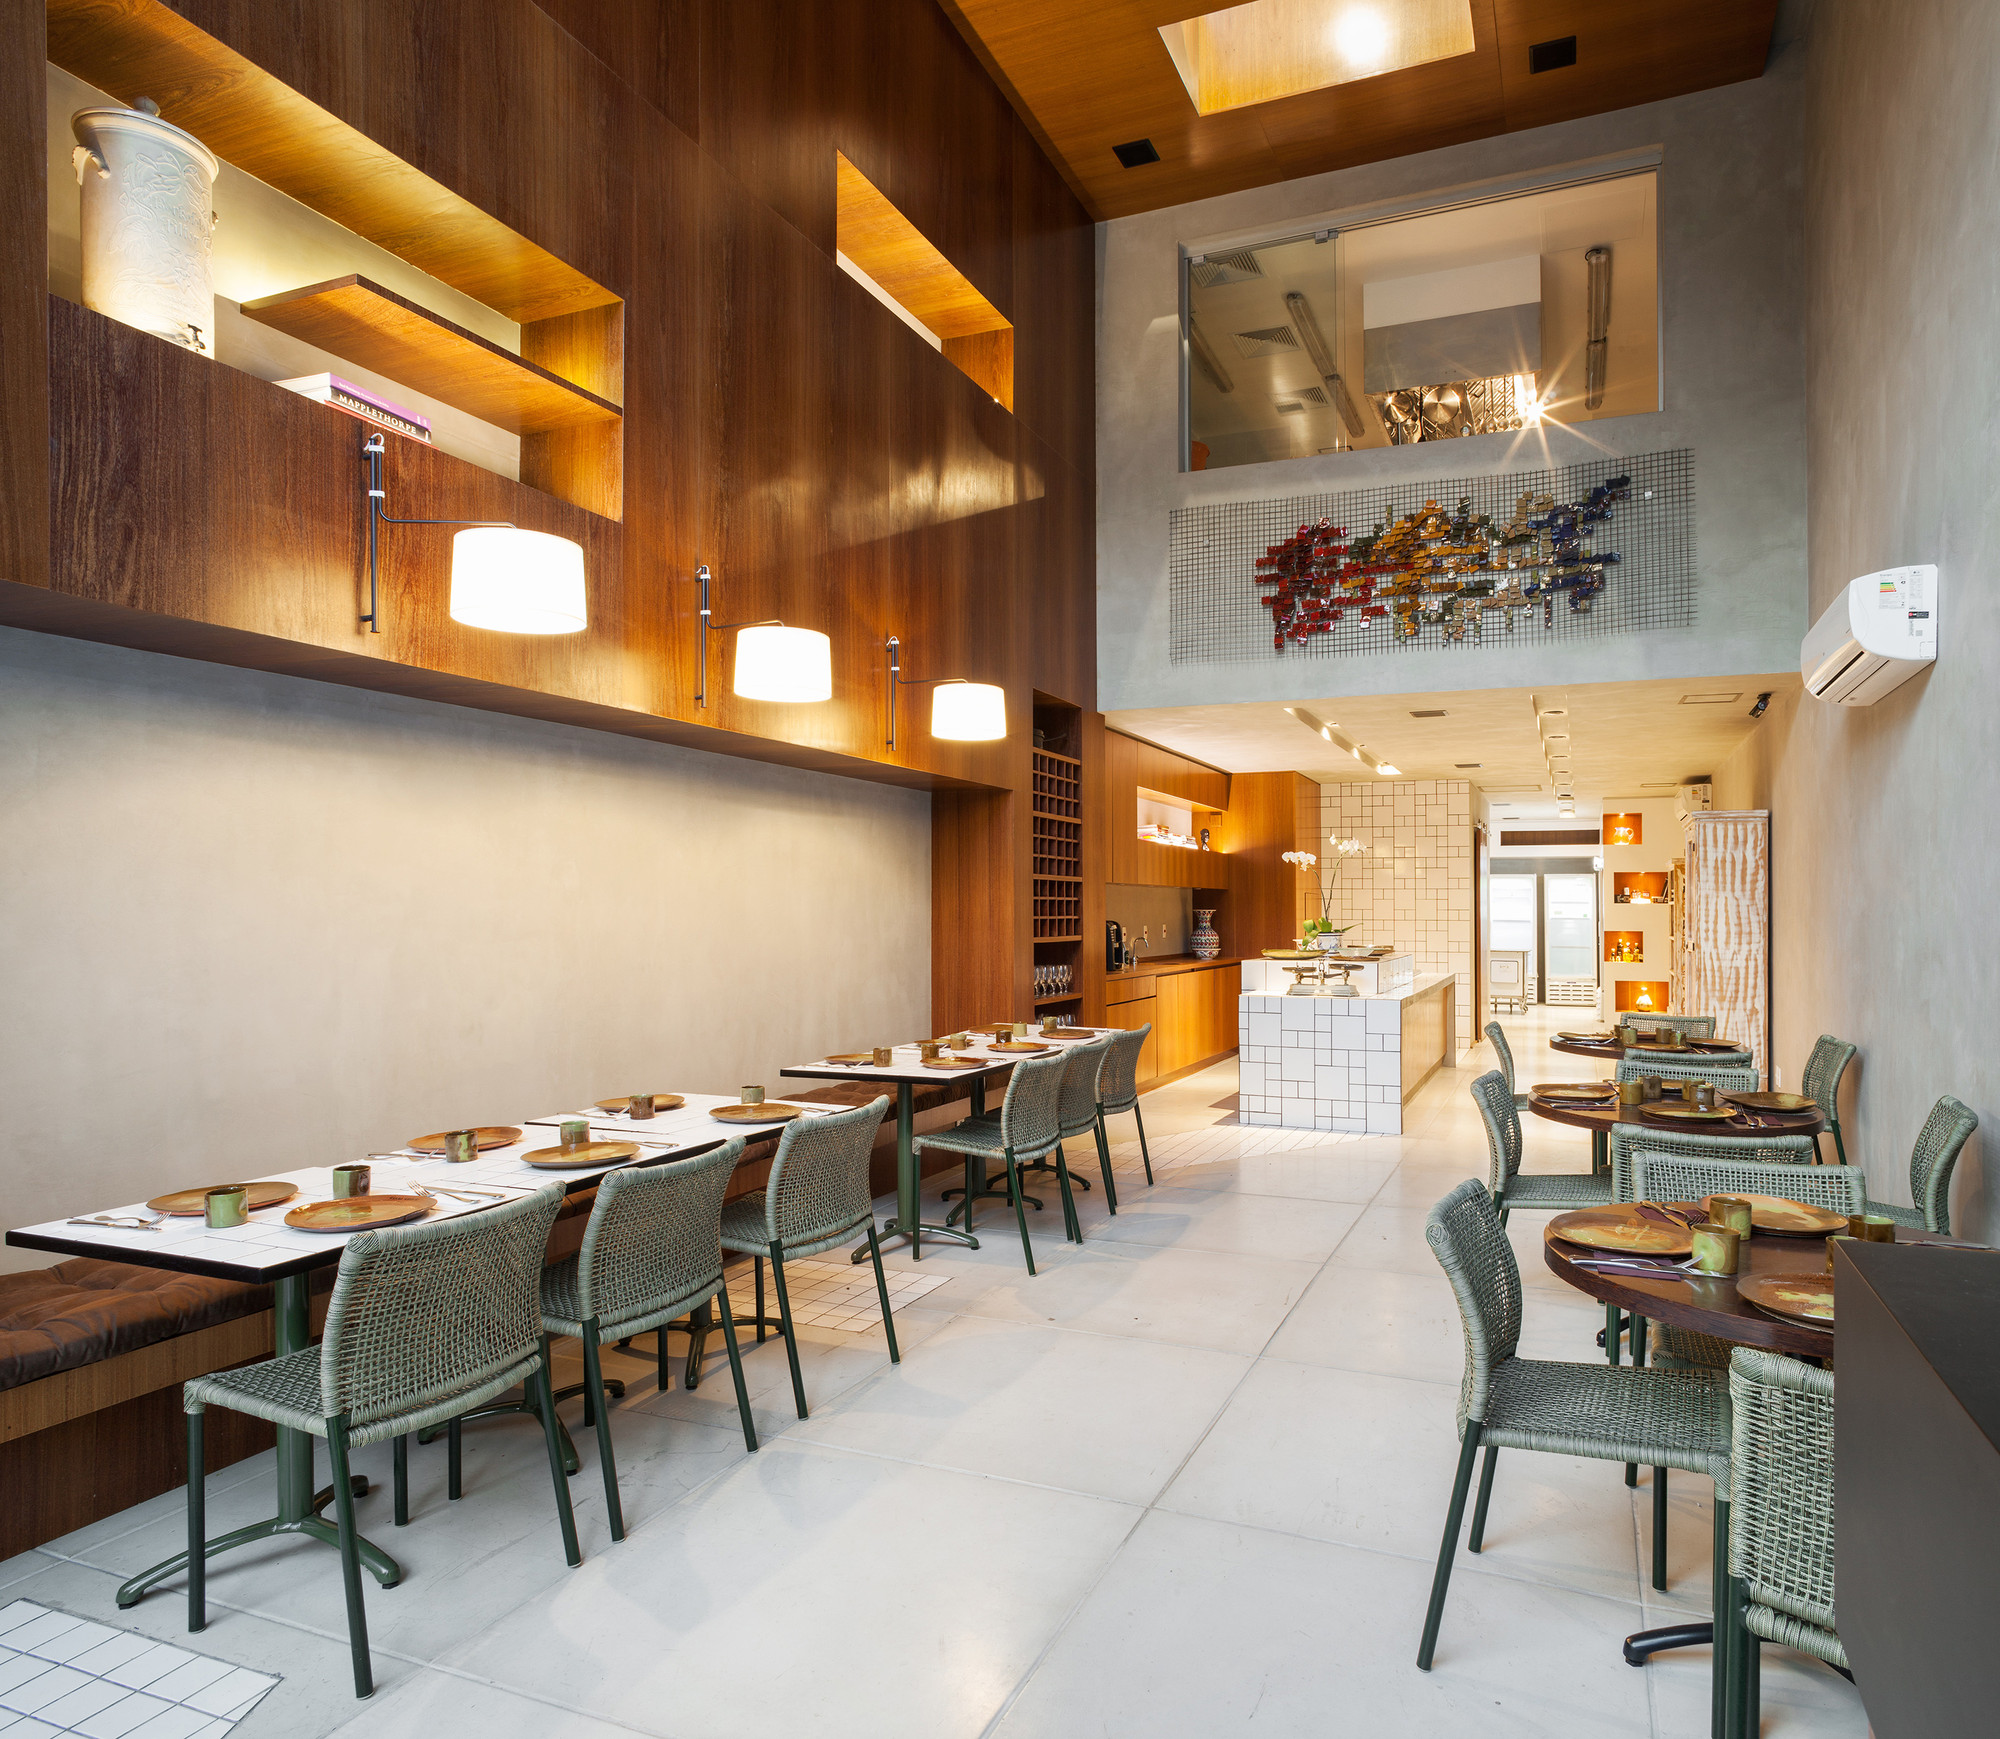 Restaurante Guilhermina / FGMF Arquitetos, © Rafaela Netto